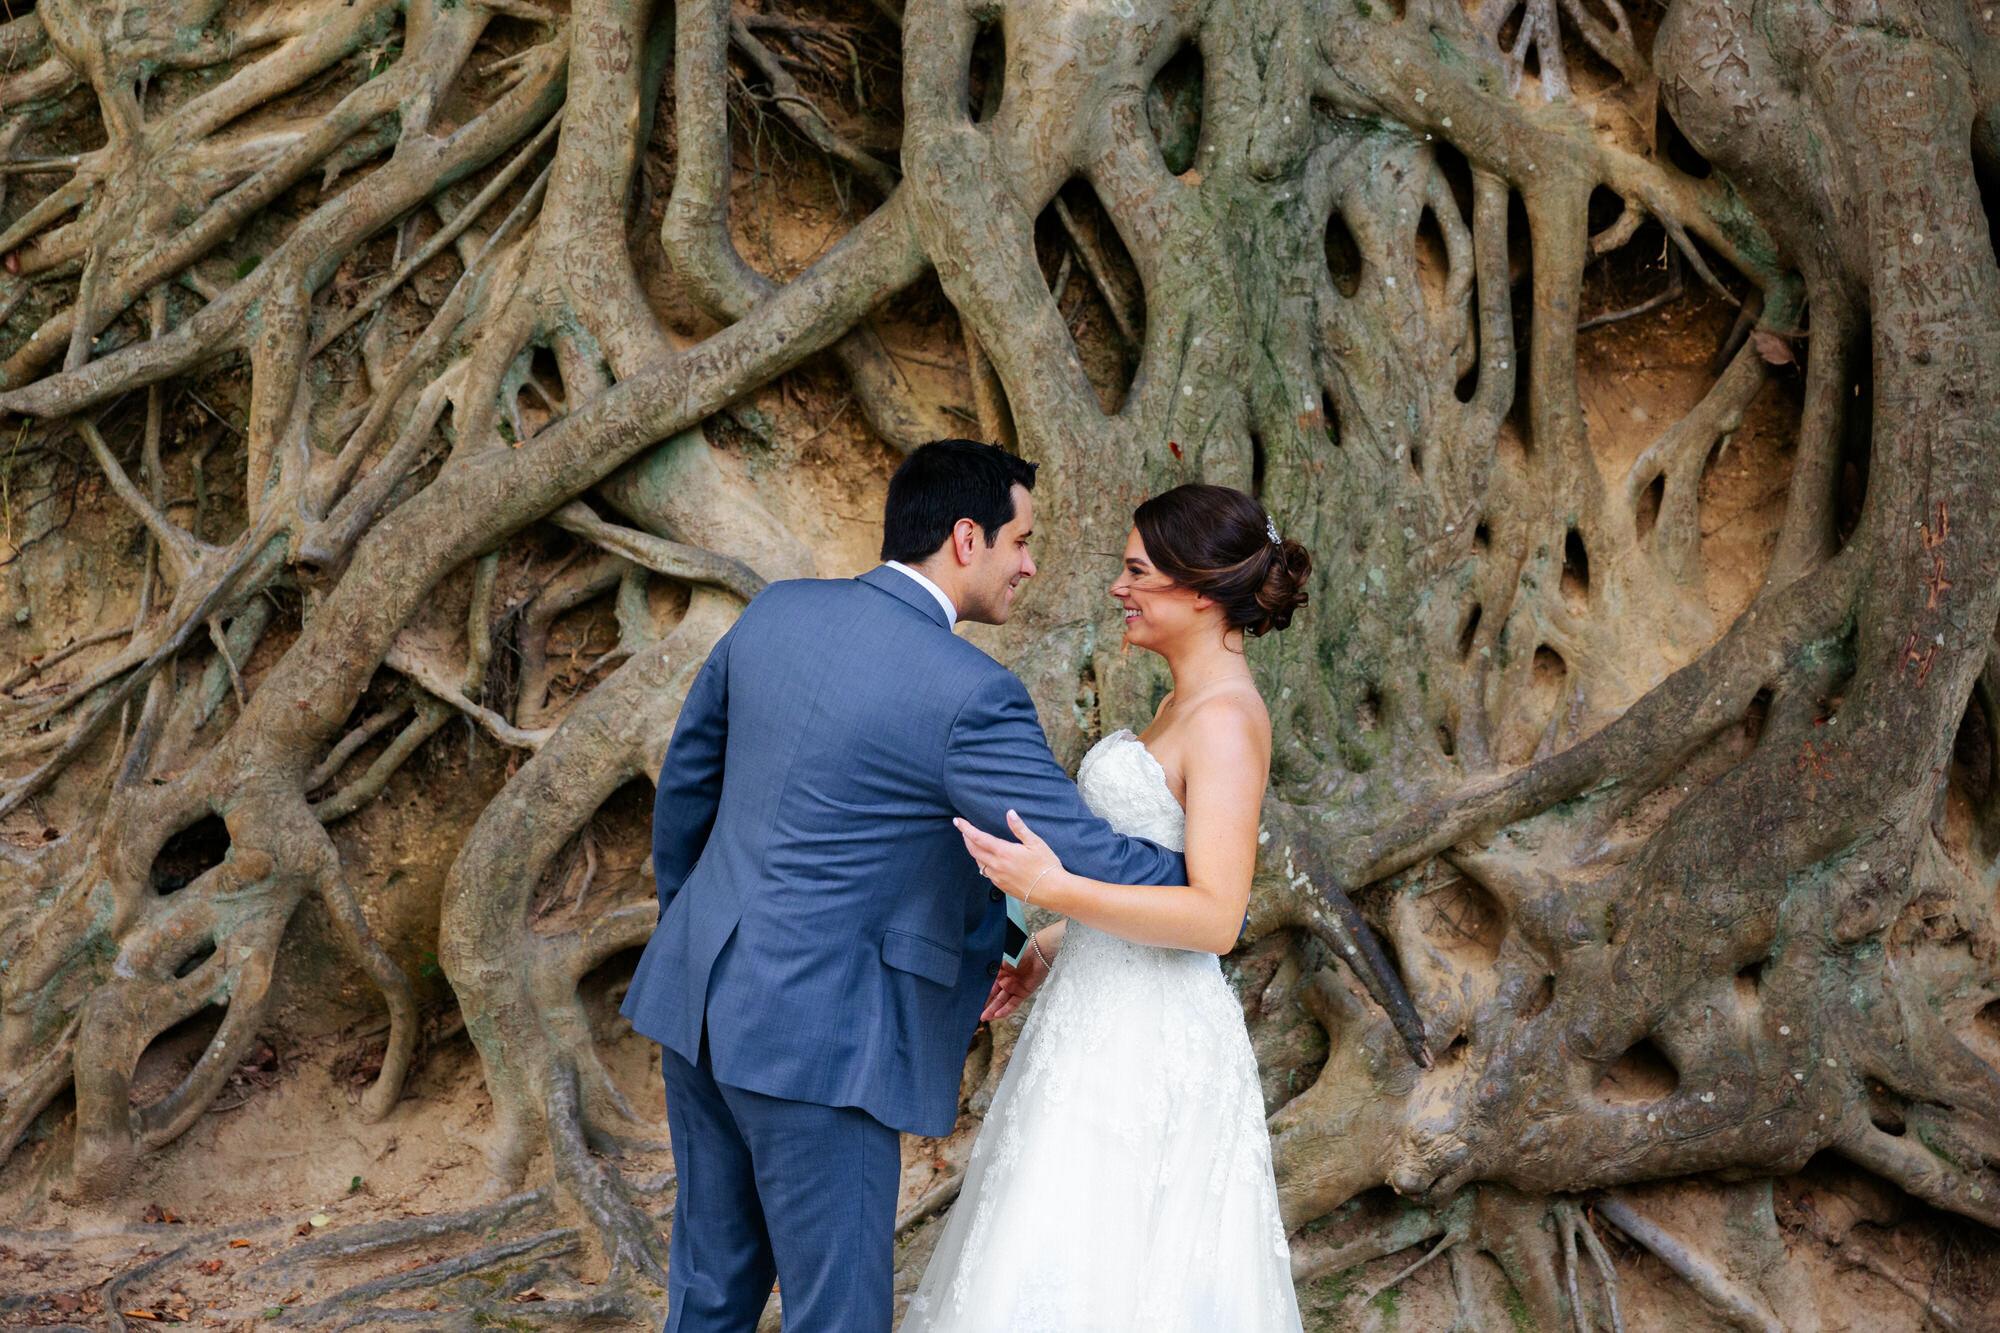 twigs-tempietto-wedding-greenville-downtown-300.JPG